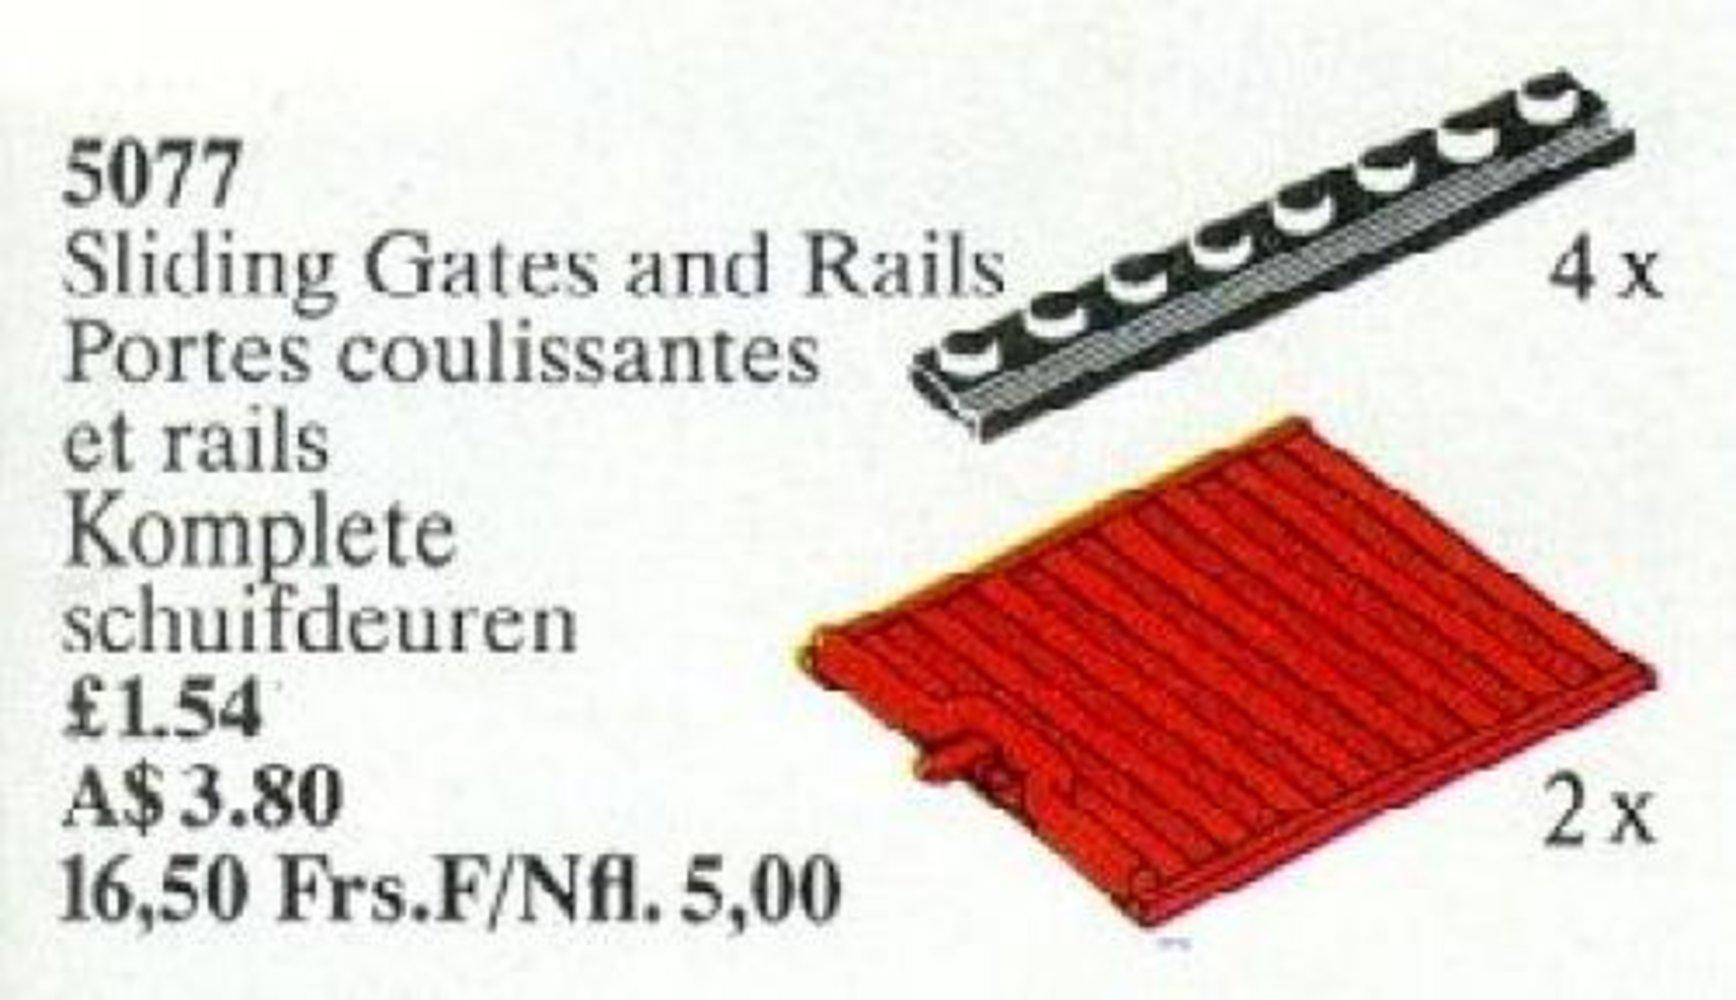 Sliding Gates and Rails